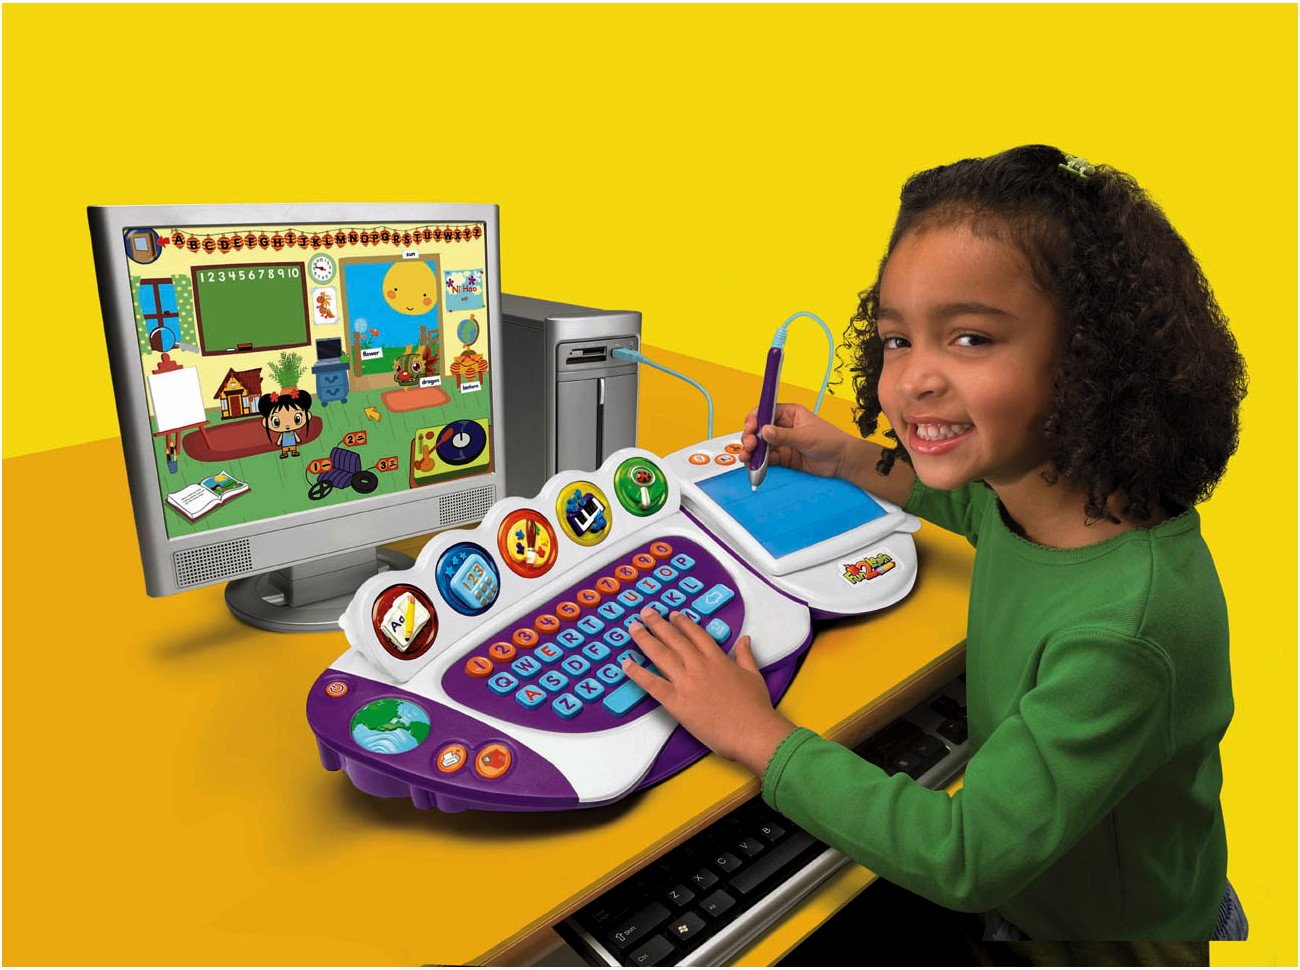 Fun 2 Learn Computer Cool School Software Kai Lan by Fisher-Price (Image #1)